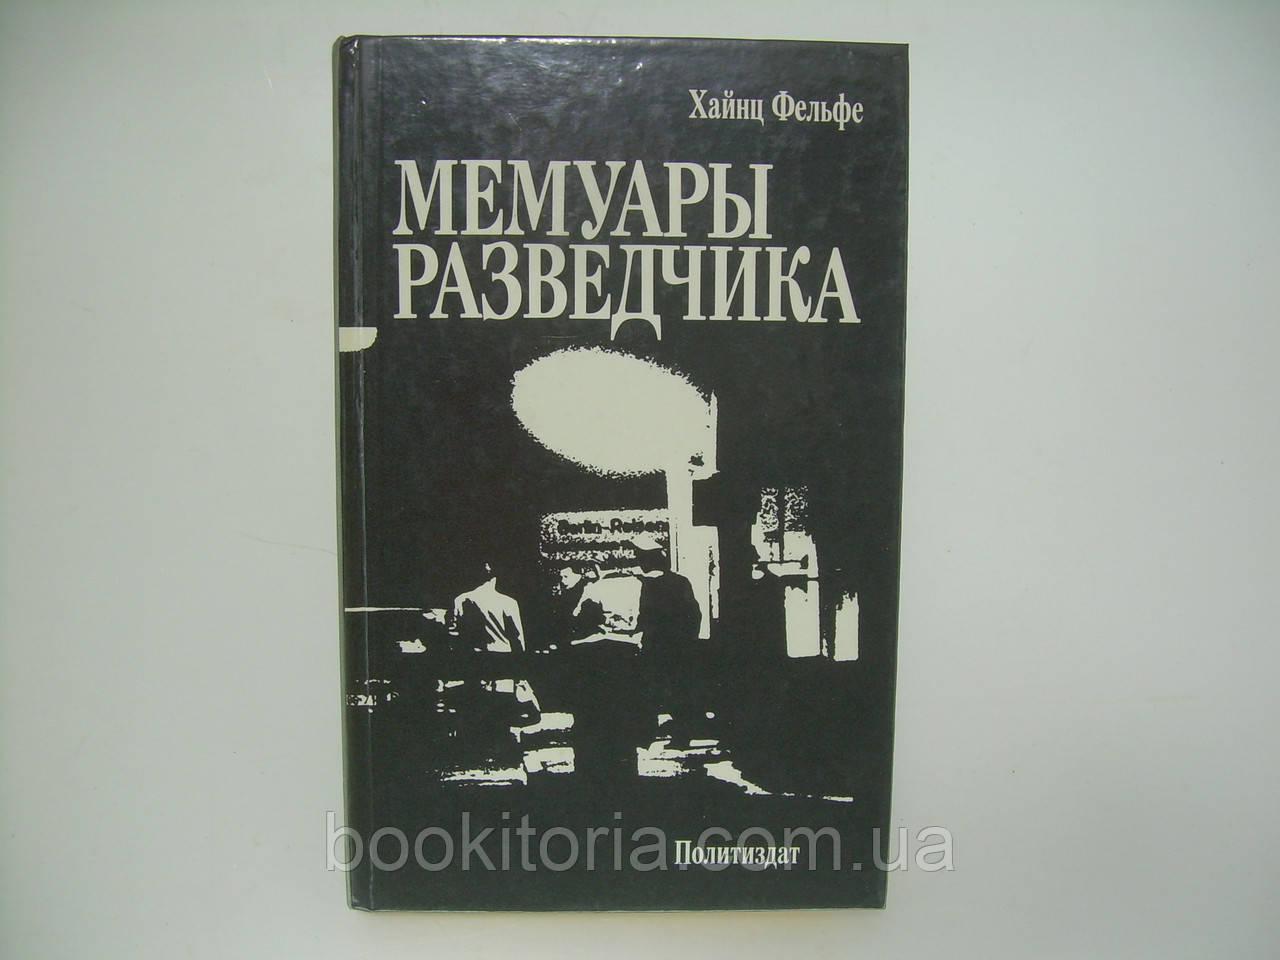 Фельфе Х. Мемуары разведчика (б/у).